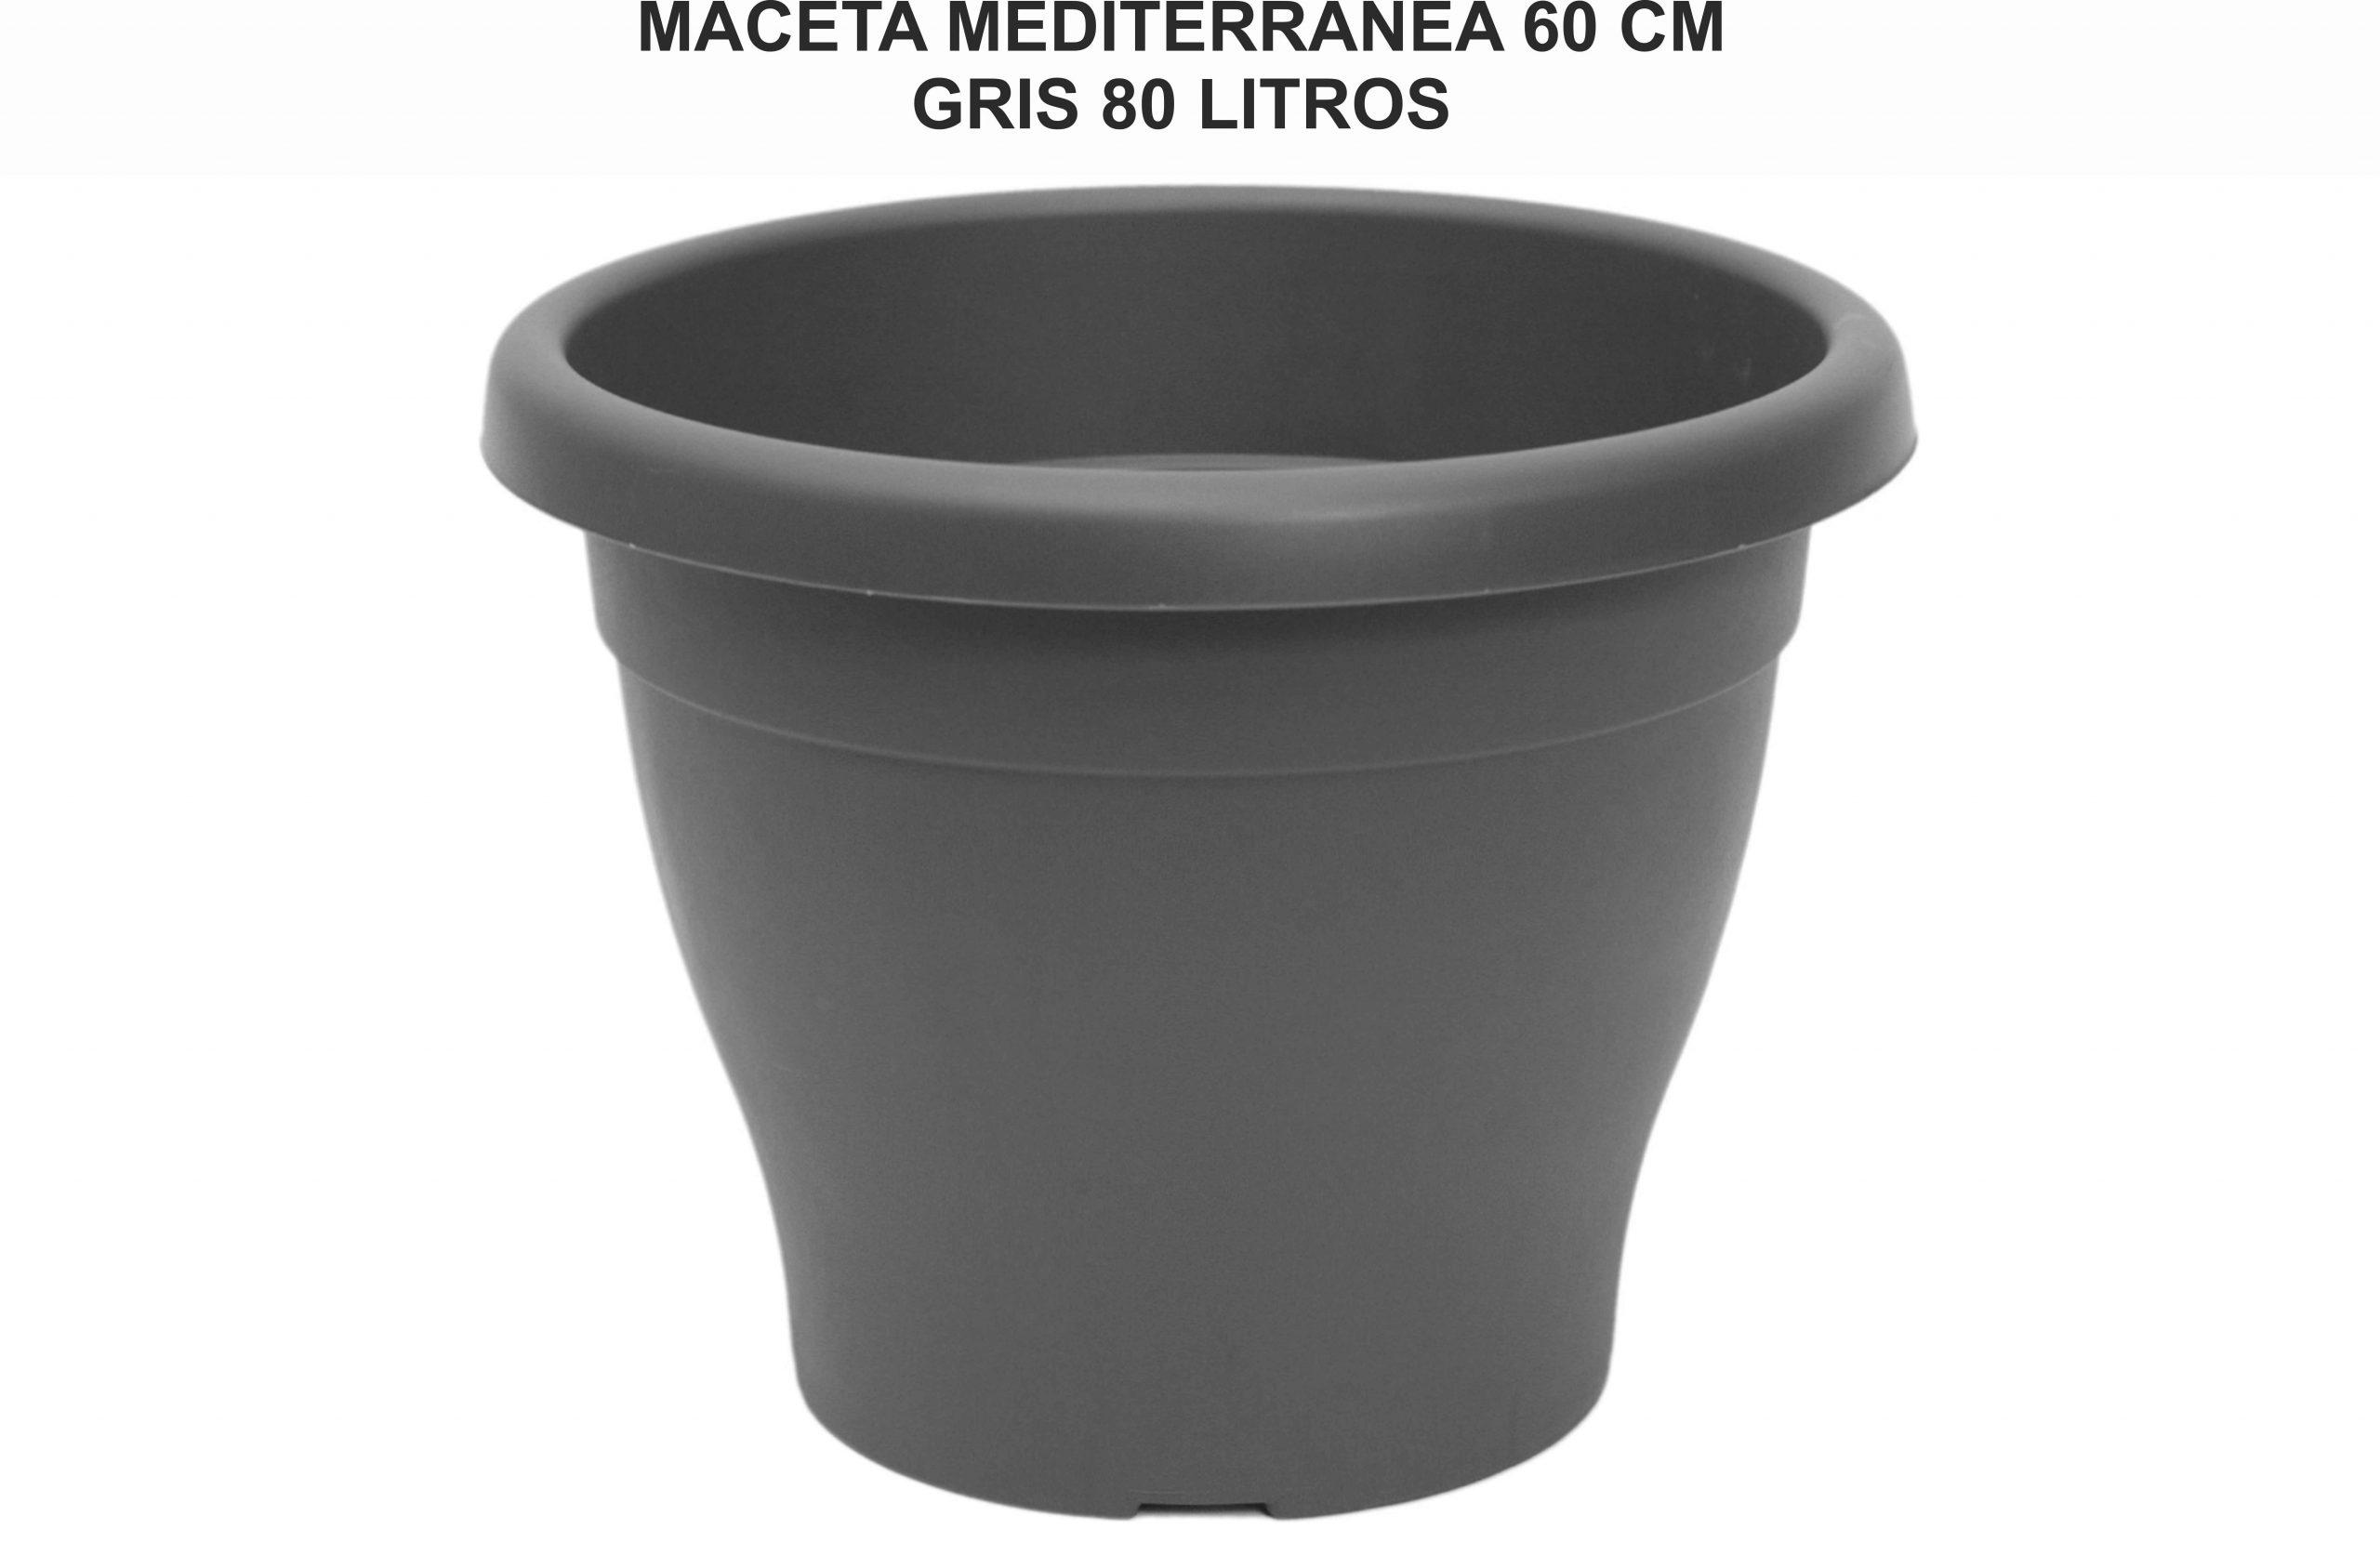 MACETA MEDITERRANEA 60 CM GRIS